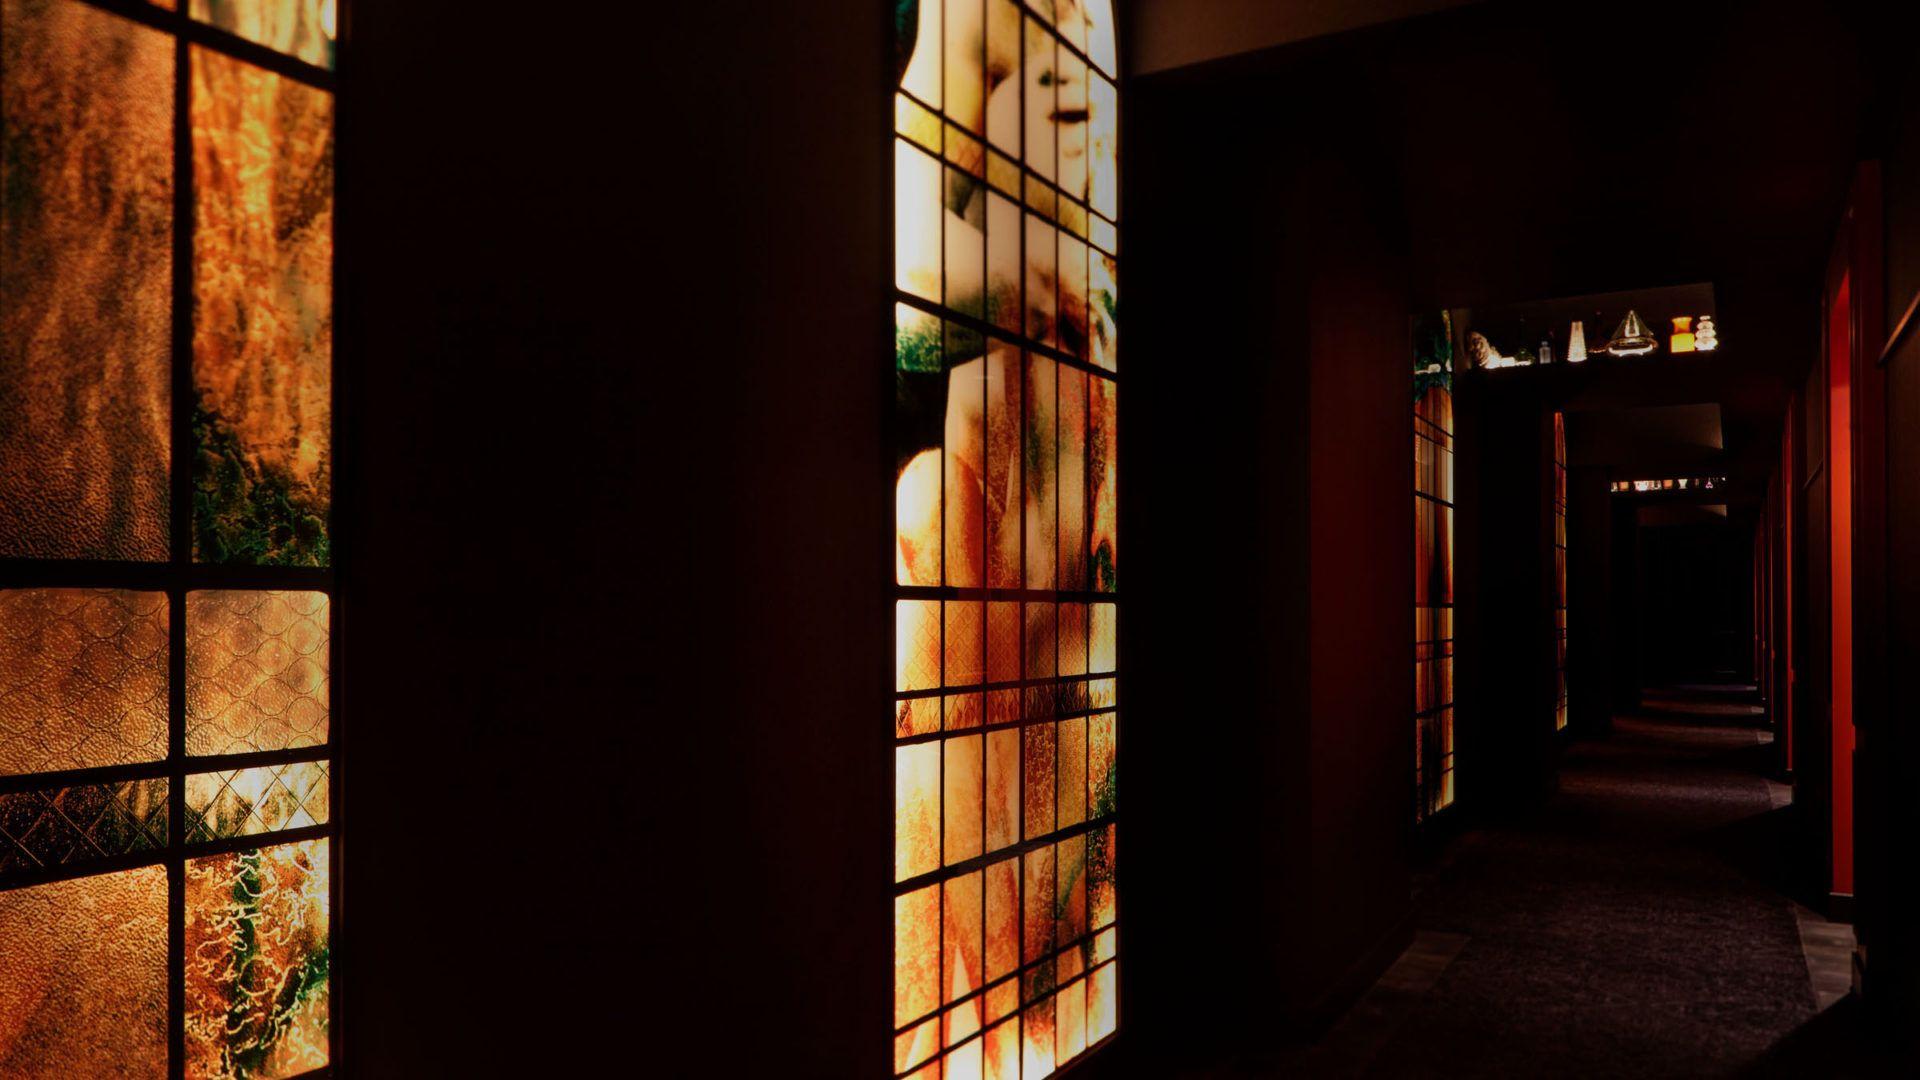 SINNER_Couloir_hotel_paris_marais_Nicolas_Receveur